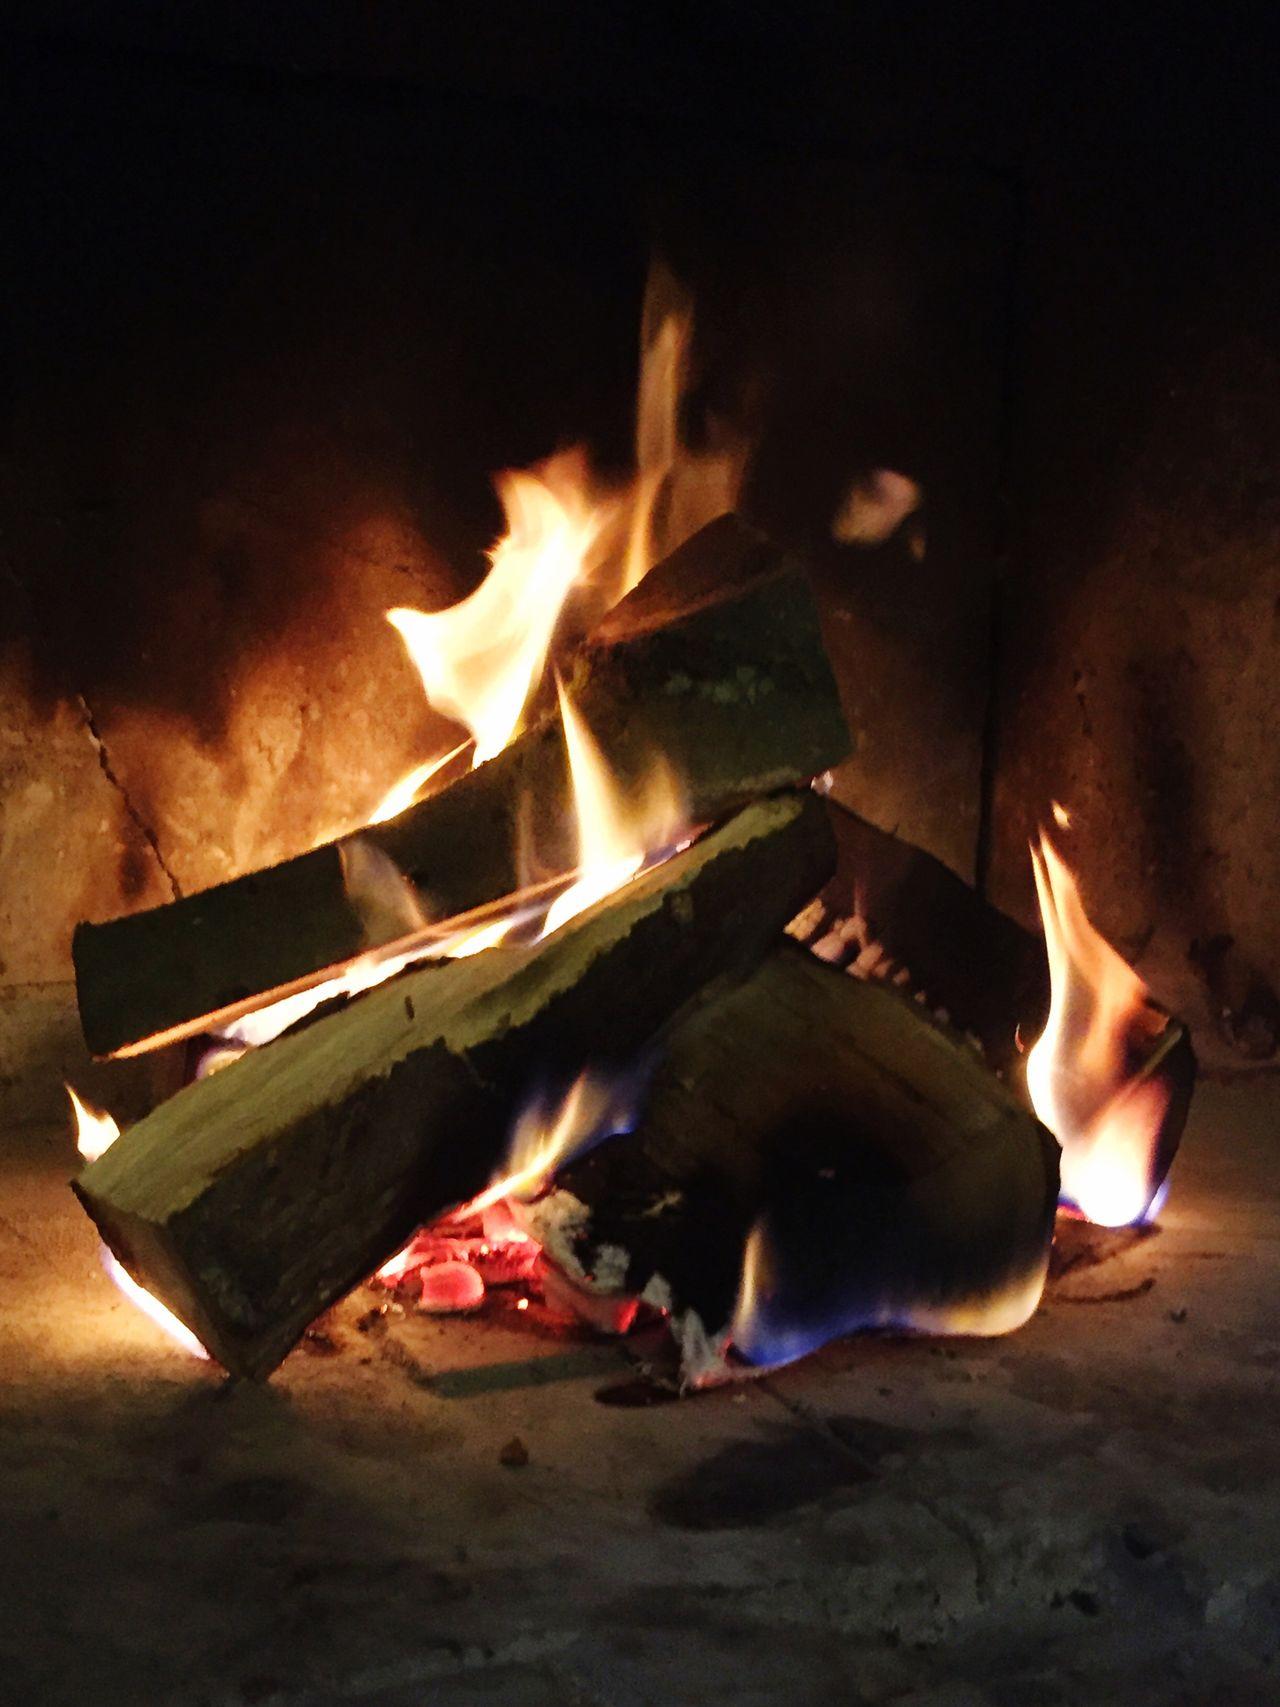 Fire Firewood Fireplace Feuer Feuer Und Flamme Feuerstelle Feuerholz Kaminfeuer Fire And Flames